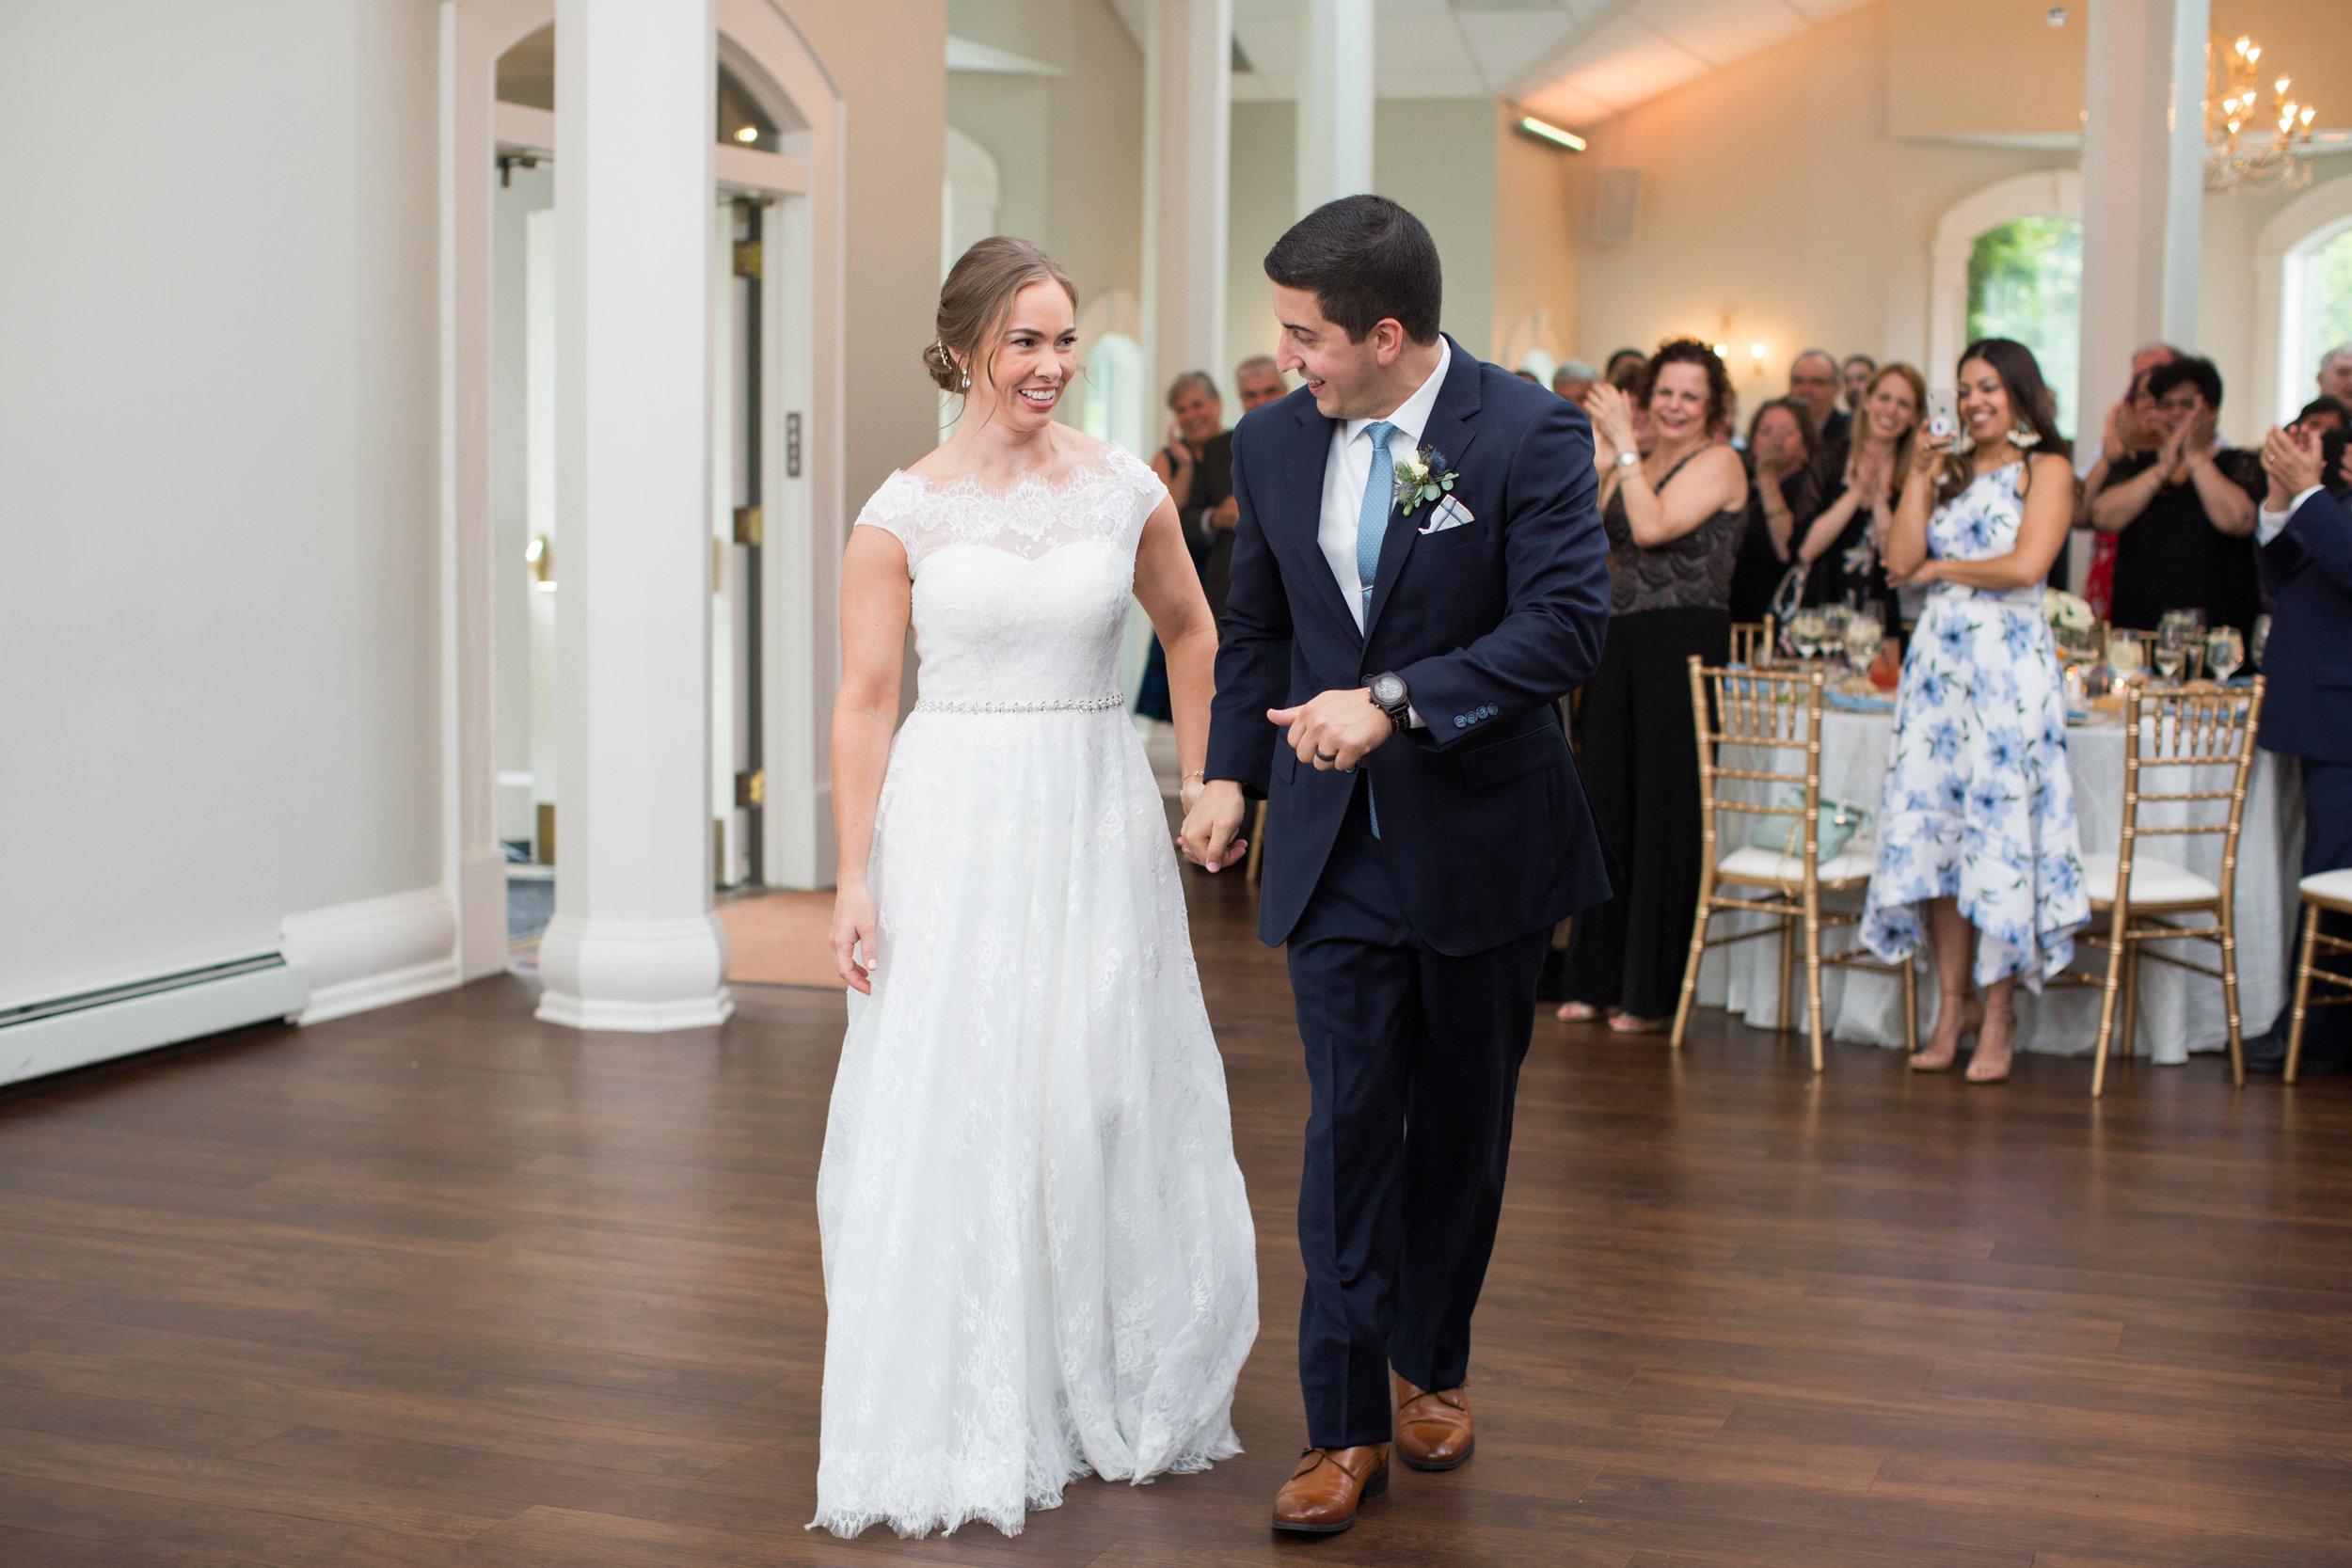 Constantino's Catering Event Venue Wedding Photos-142.jpg